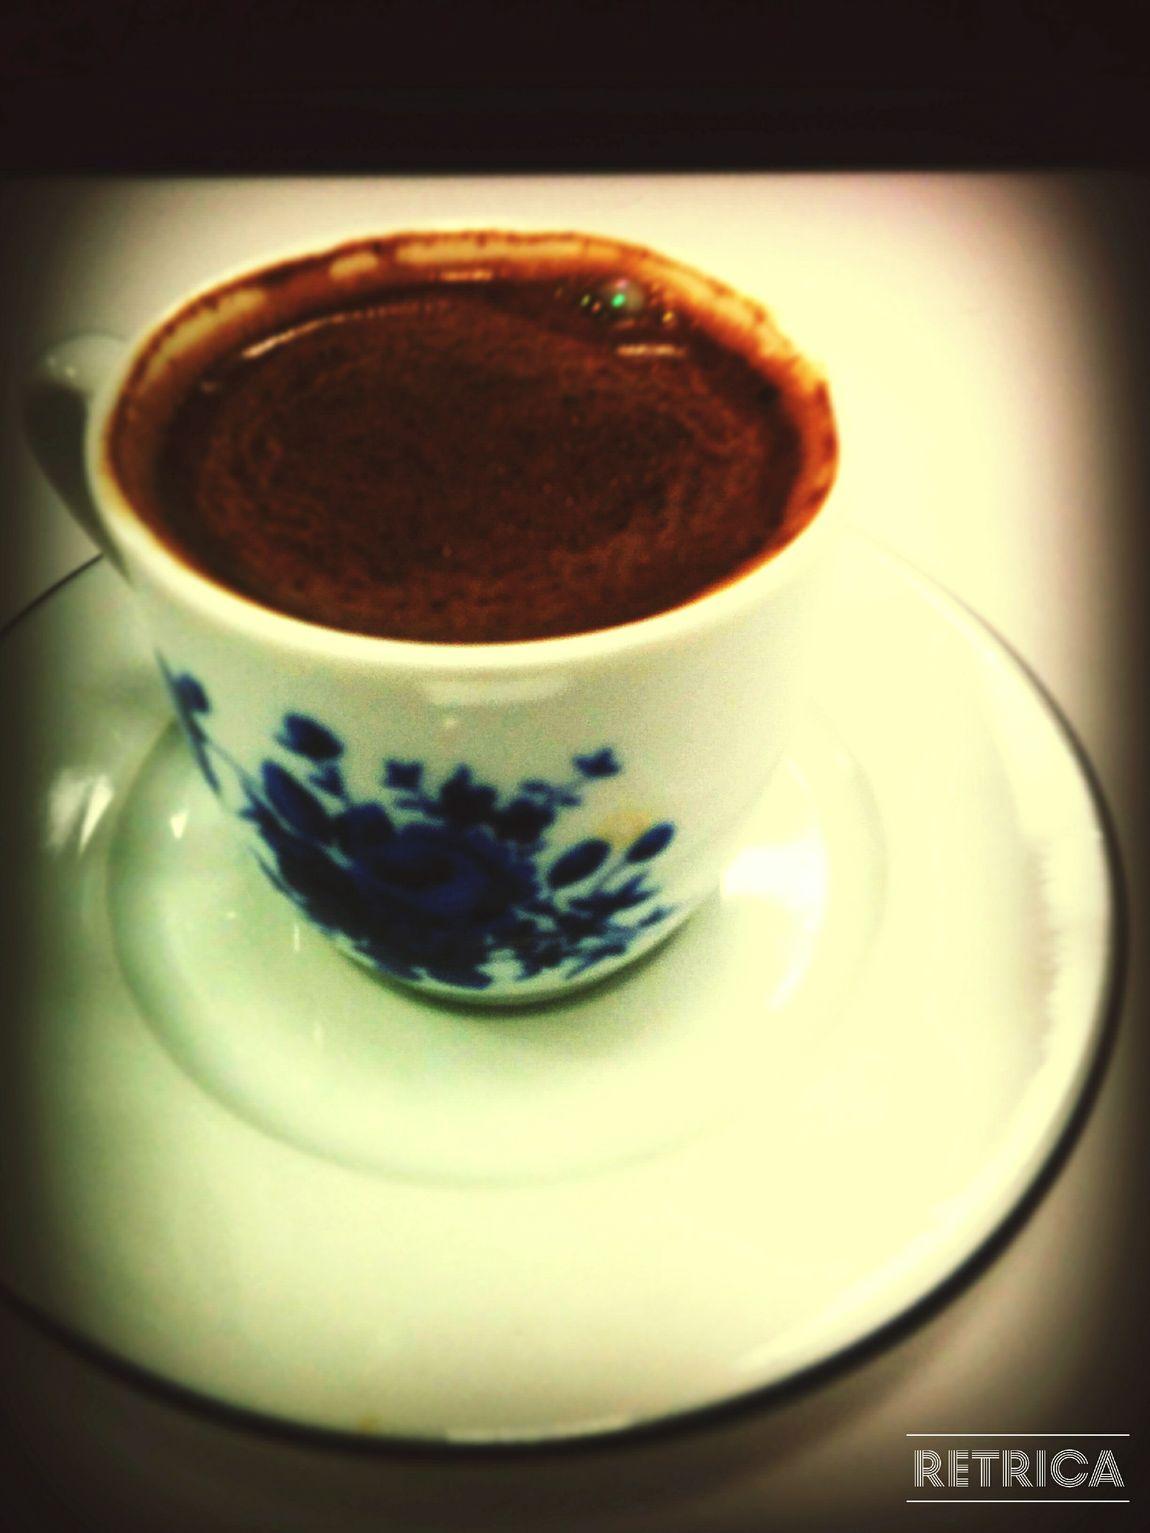 Money Cash turkish coffe